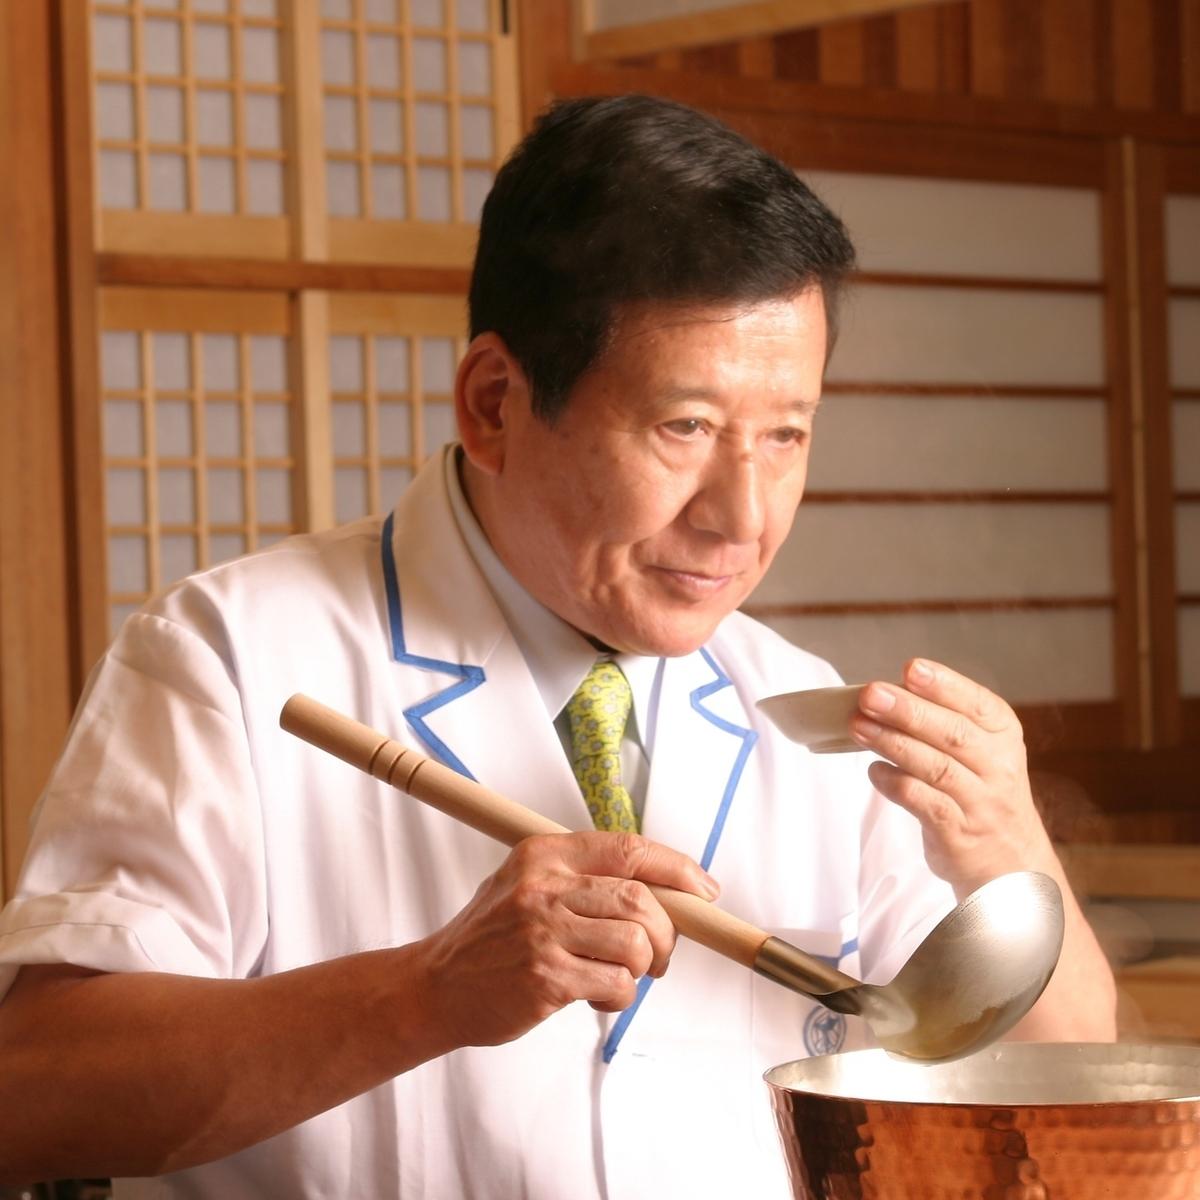 【Kanda Tawa Toshiro監督】【2018  -  2019季】【暖鍋火鍋節】